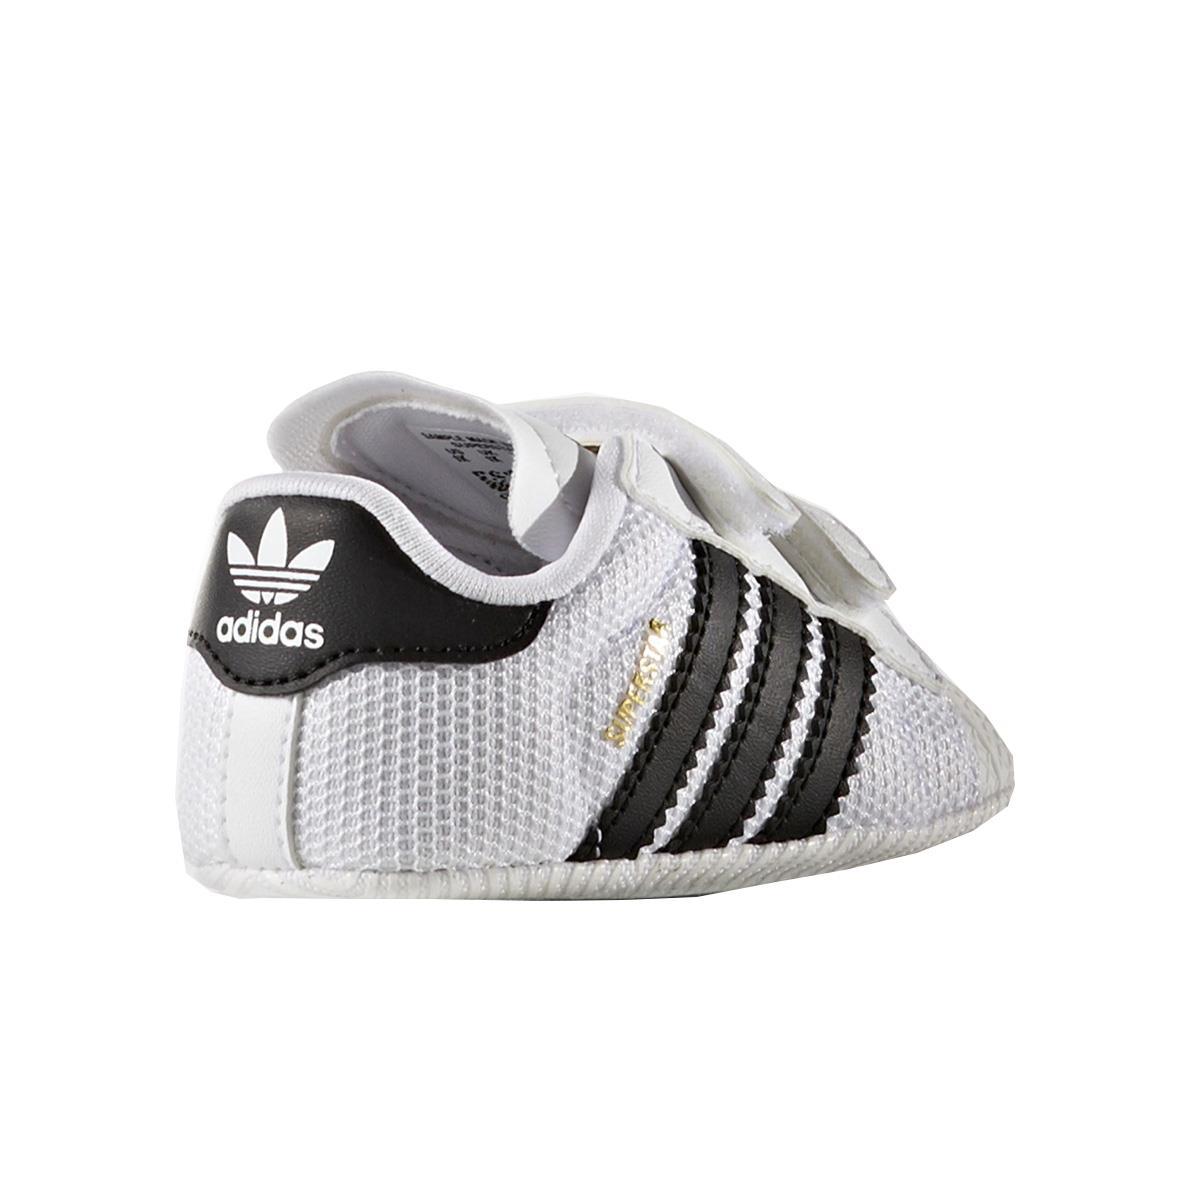 dbae940b7 Tênis Adidas Superstar Crib Infantil